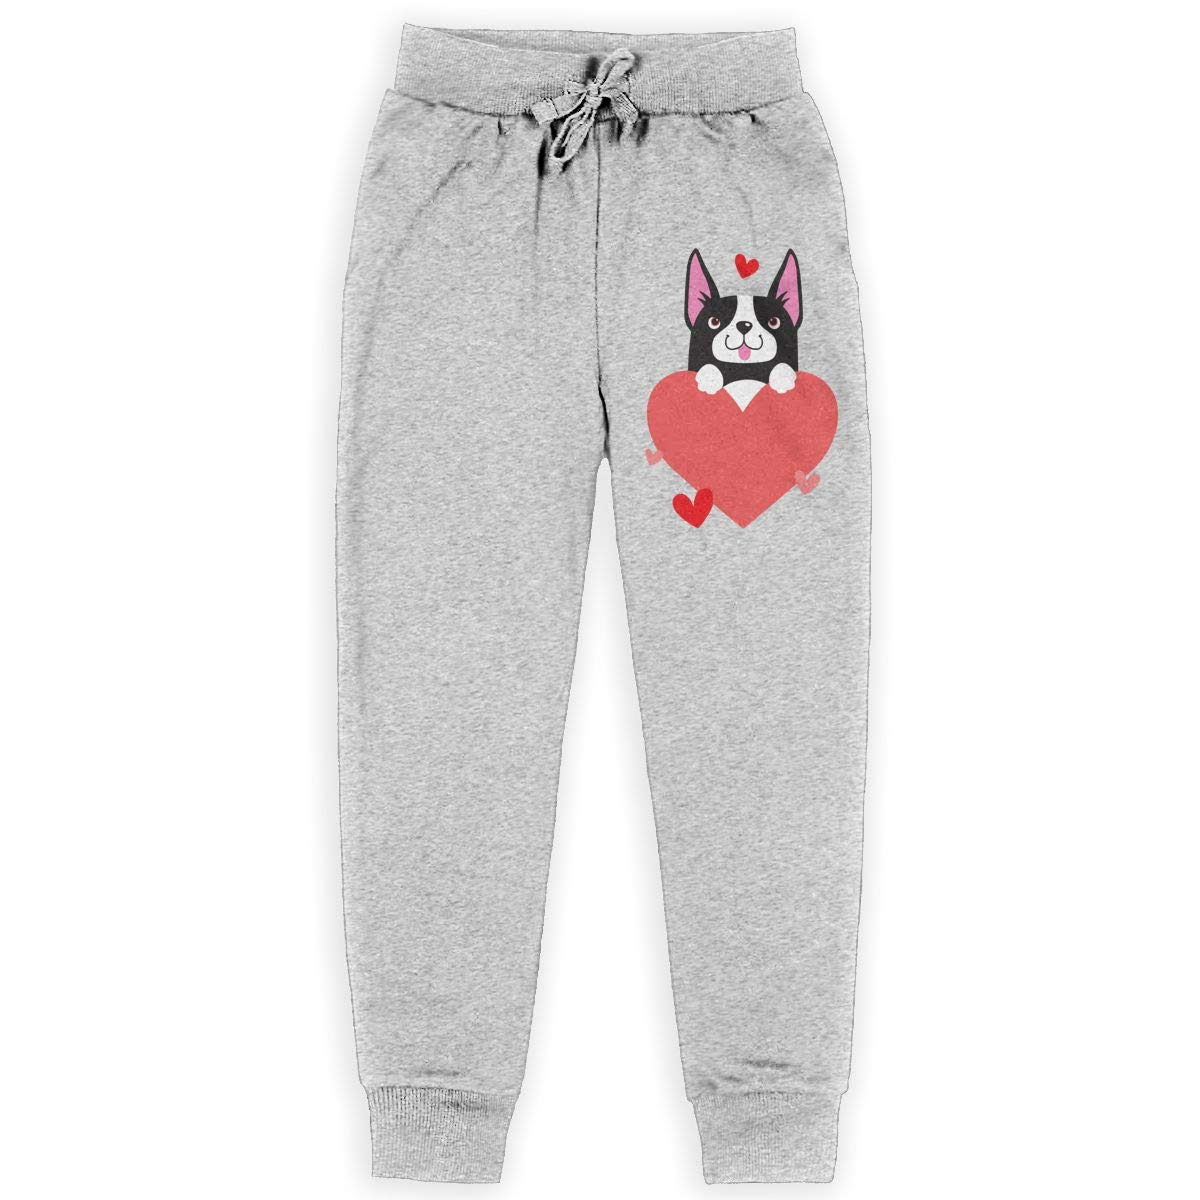 Youth Active Basic Jogger Fleece Pants for Teen Boy WYZVK22 Cartoon Boston Terrier Holding Heart Soft//Cozy Sweatpants